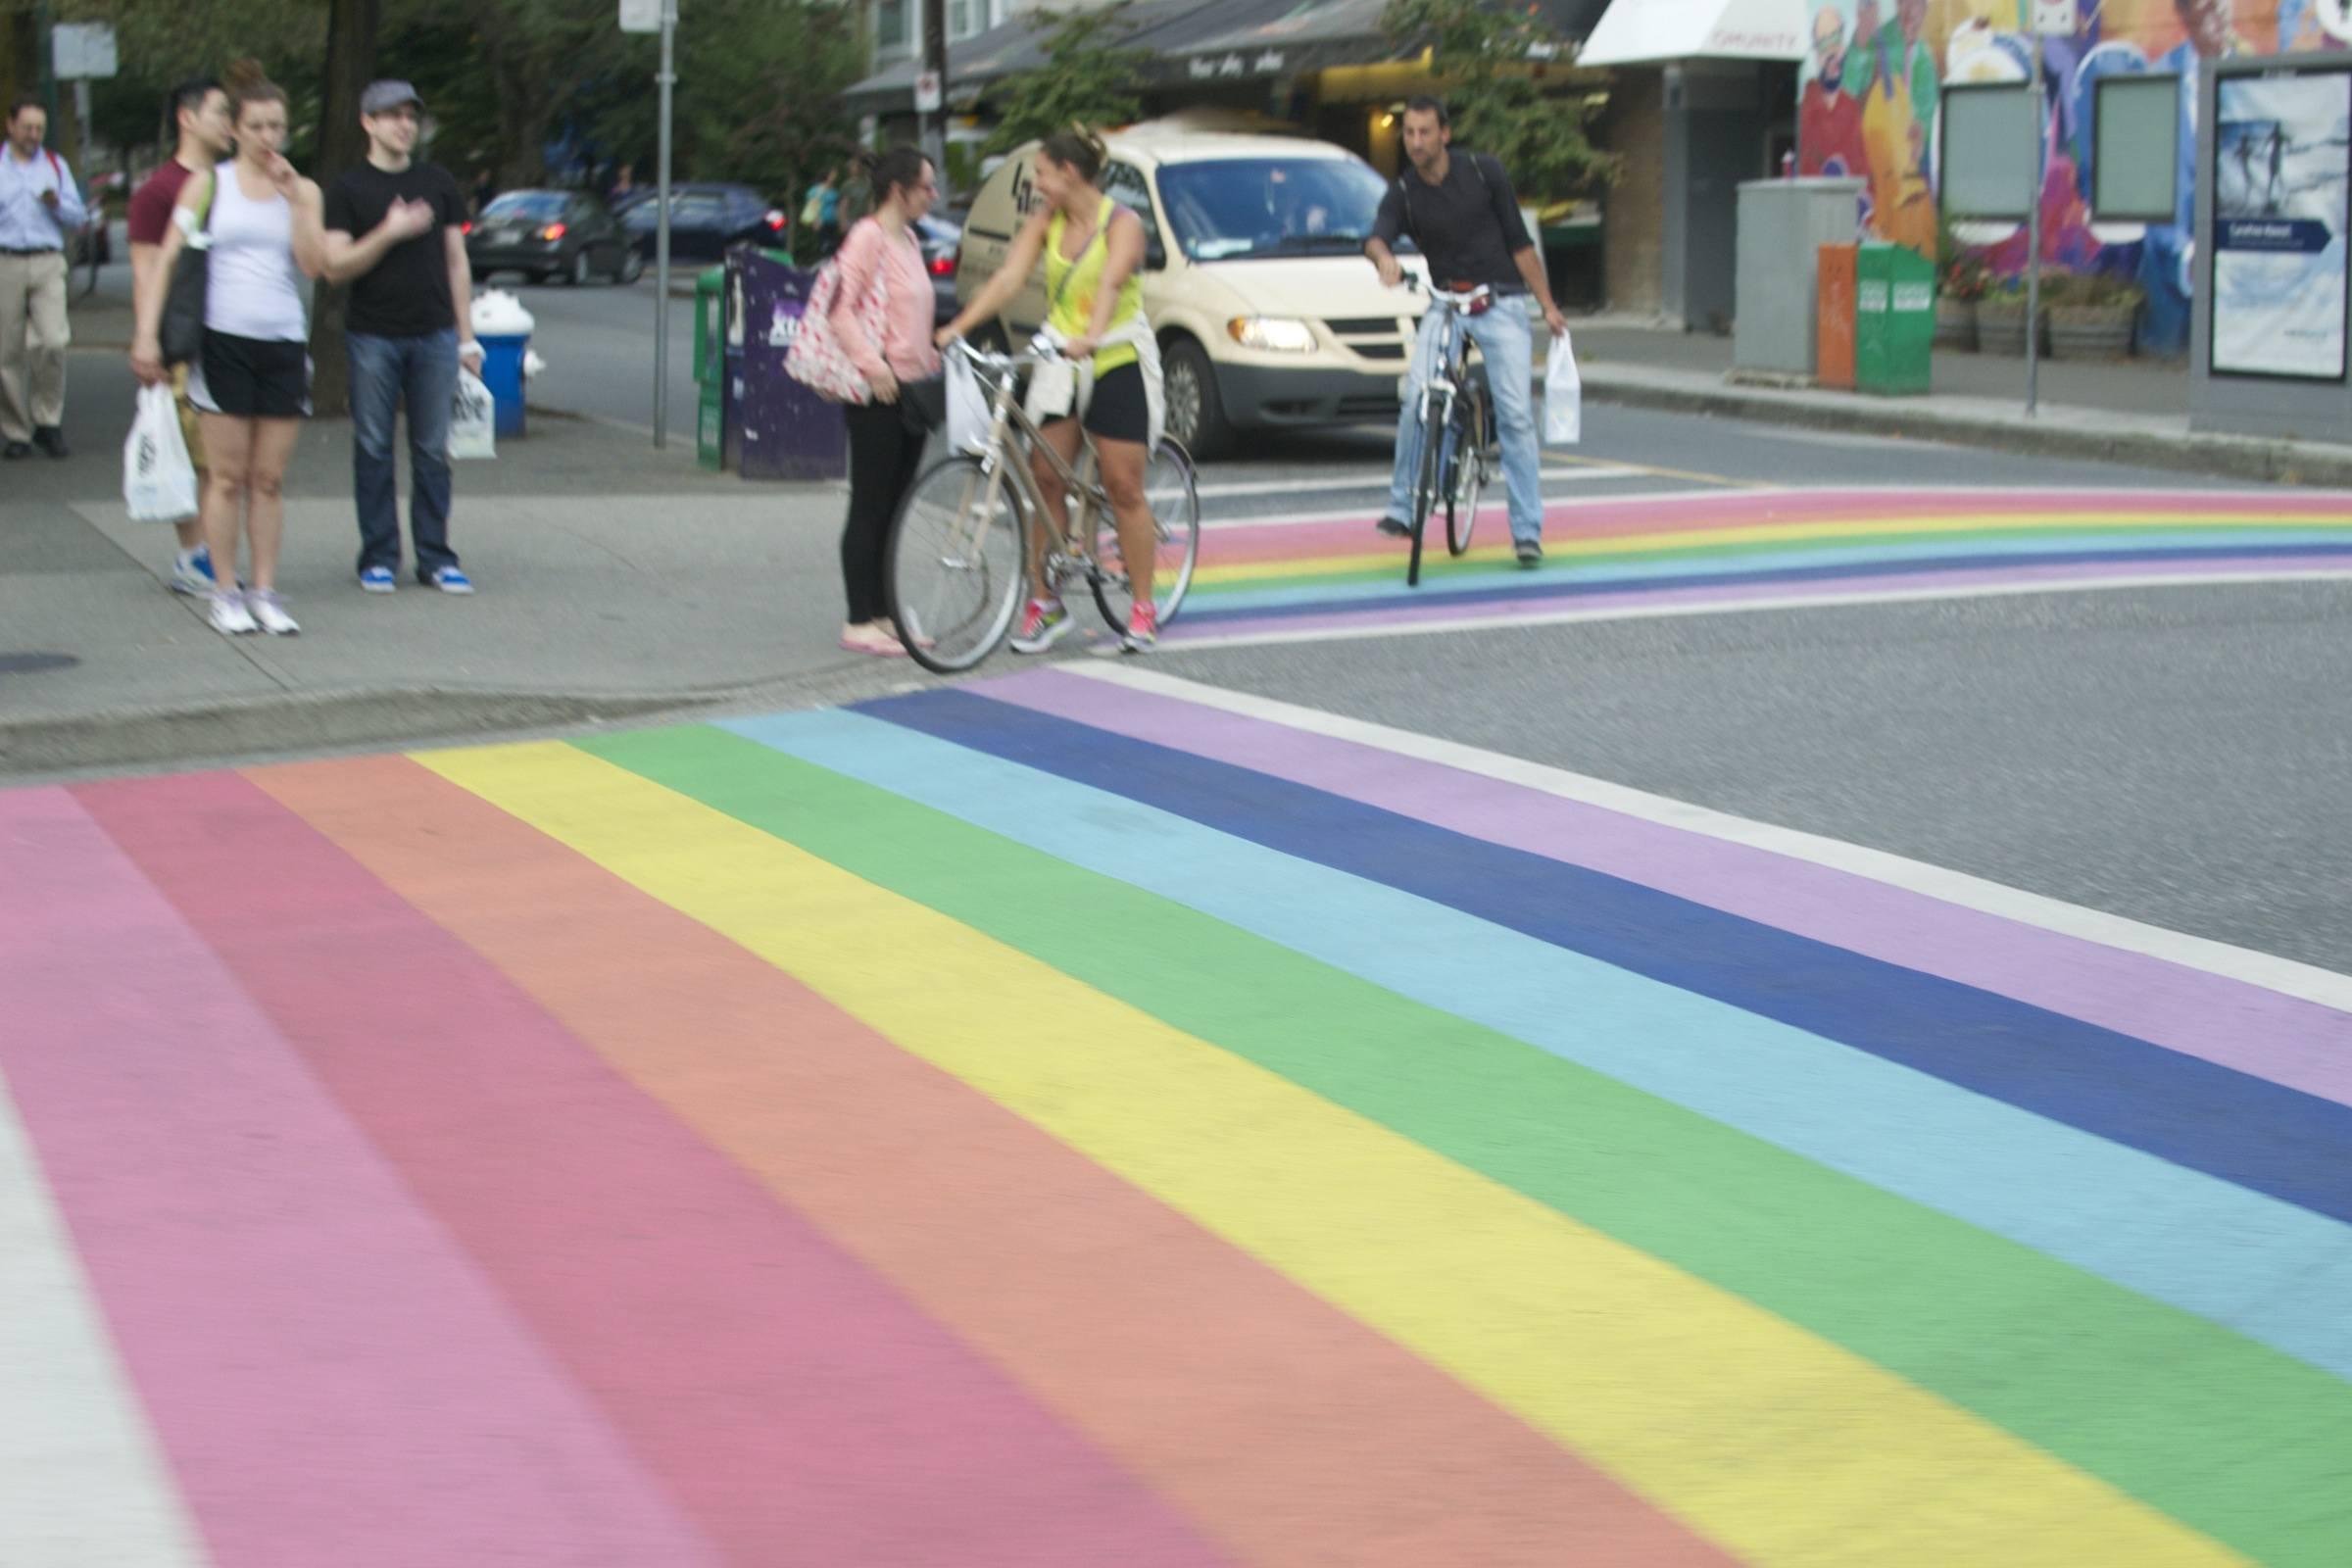 Davie Street has Canada's first permanent rainbow-coloured crosswalk, I approve!